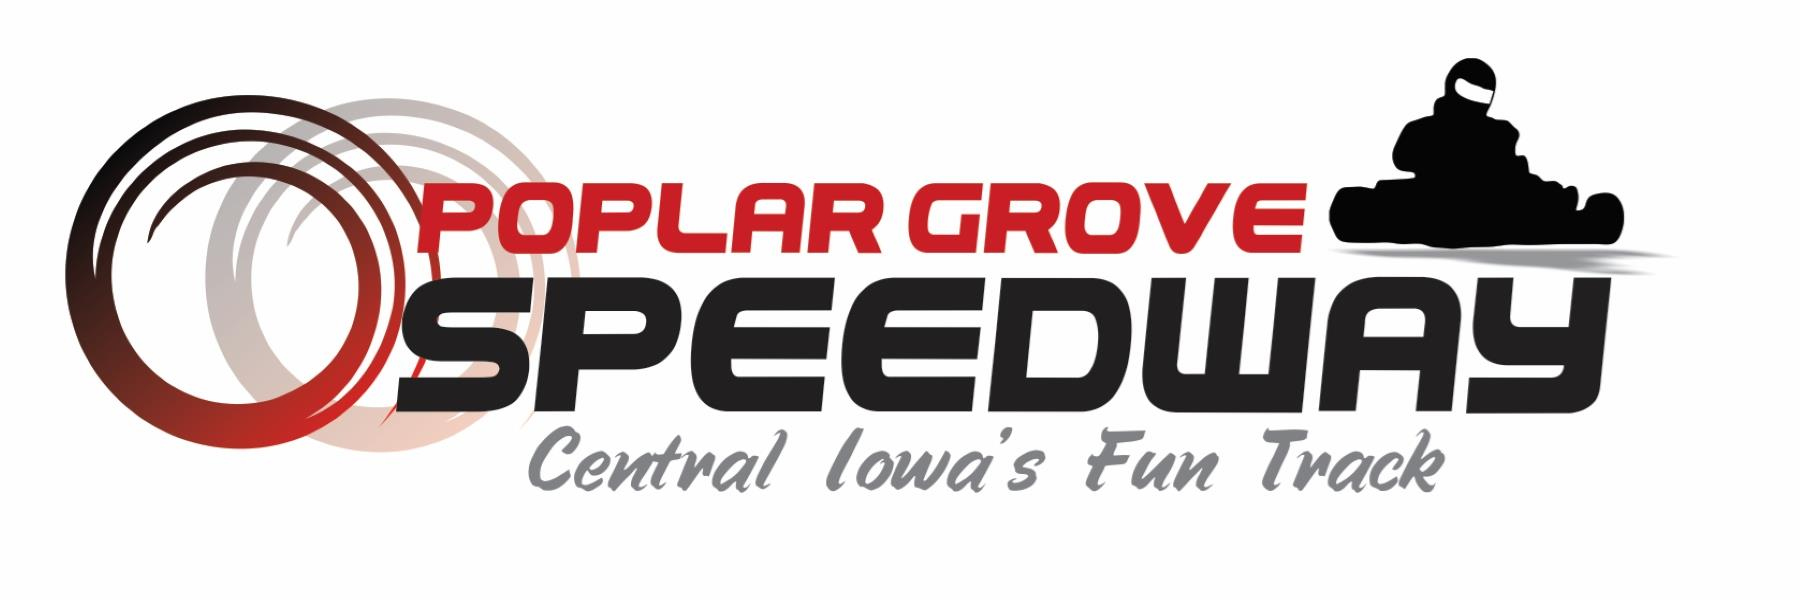 9/4/2021 - Poplar Grove Speedway